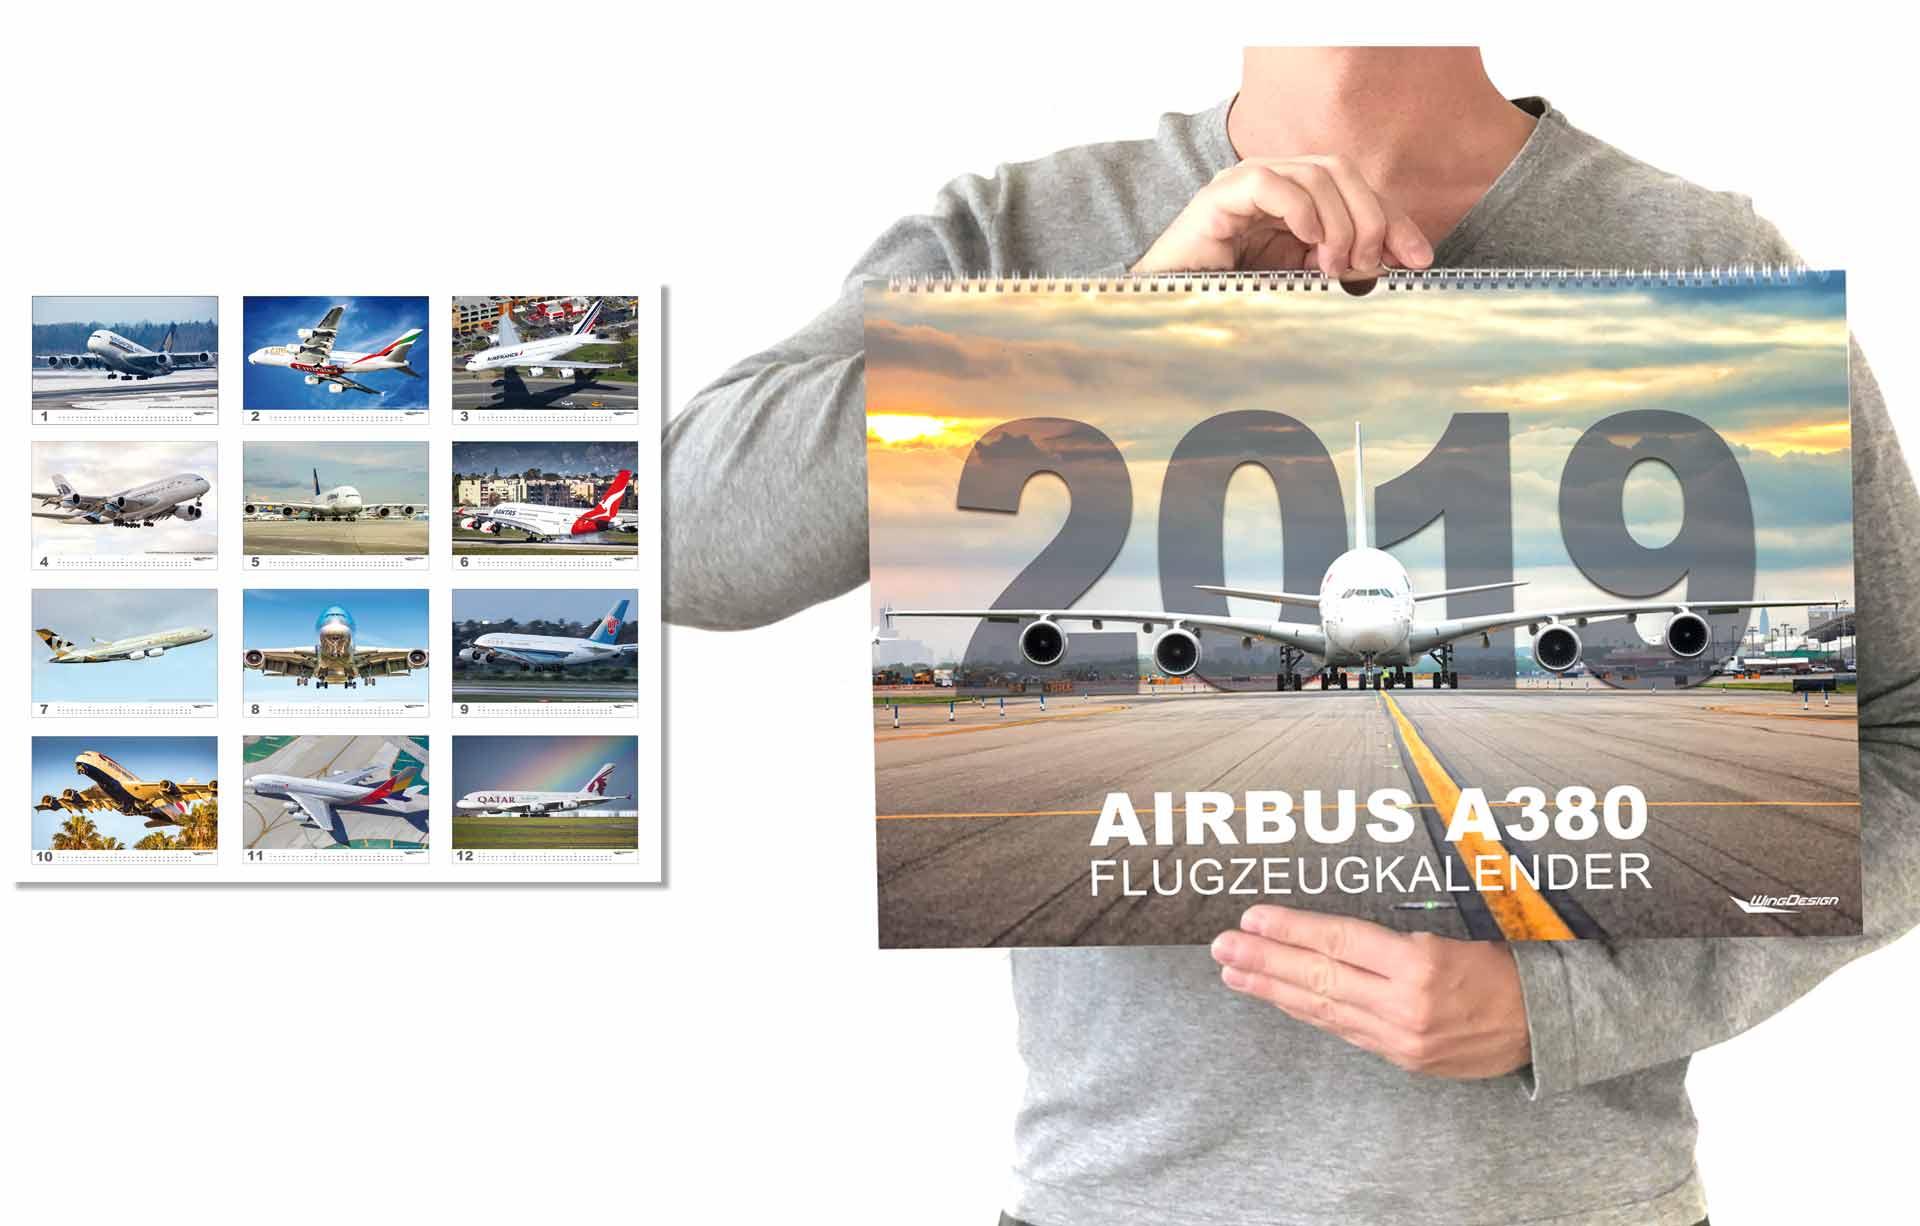 Airbus Flugzeugkalender 2019